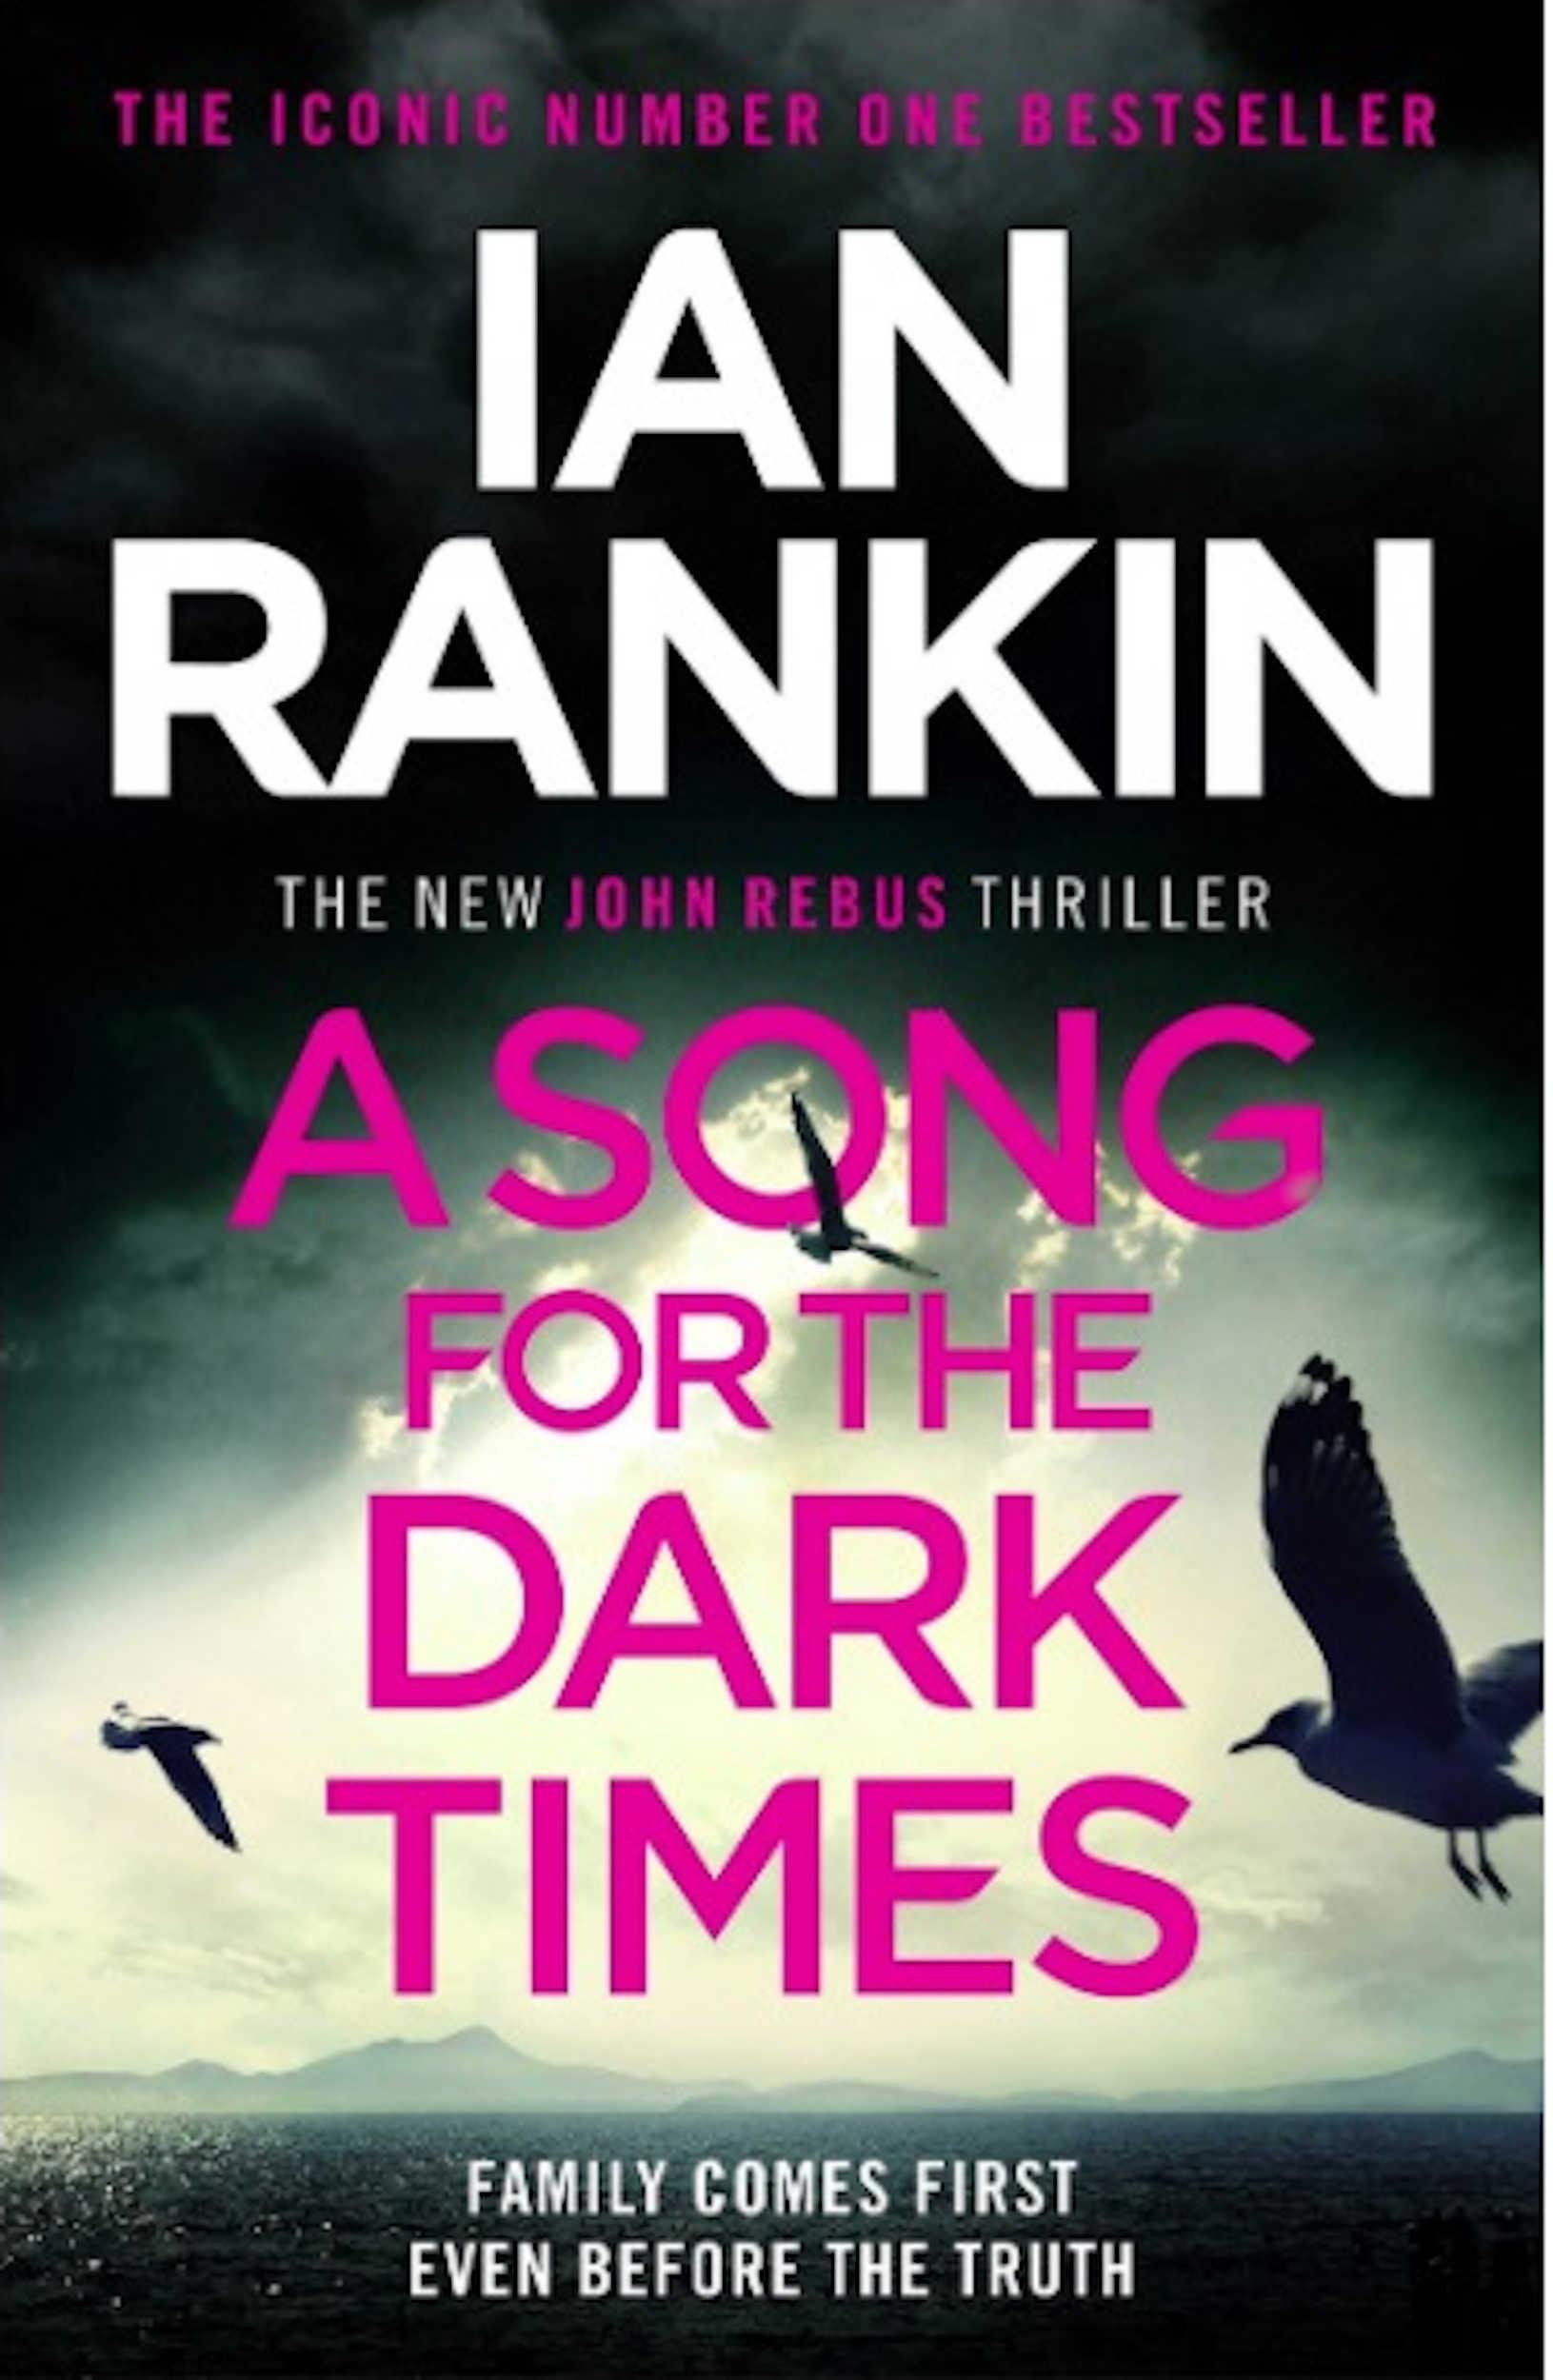 Ian Rankin's book- Scottish News